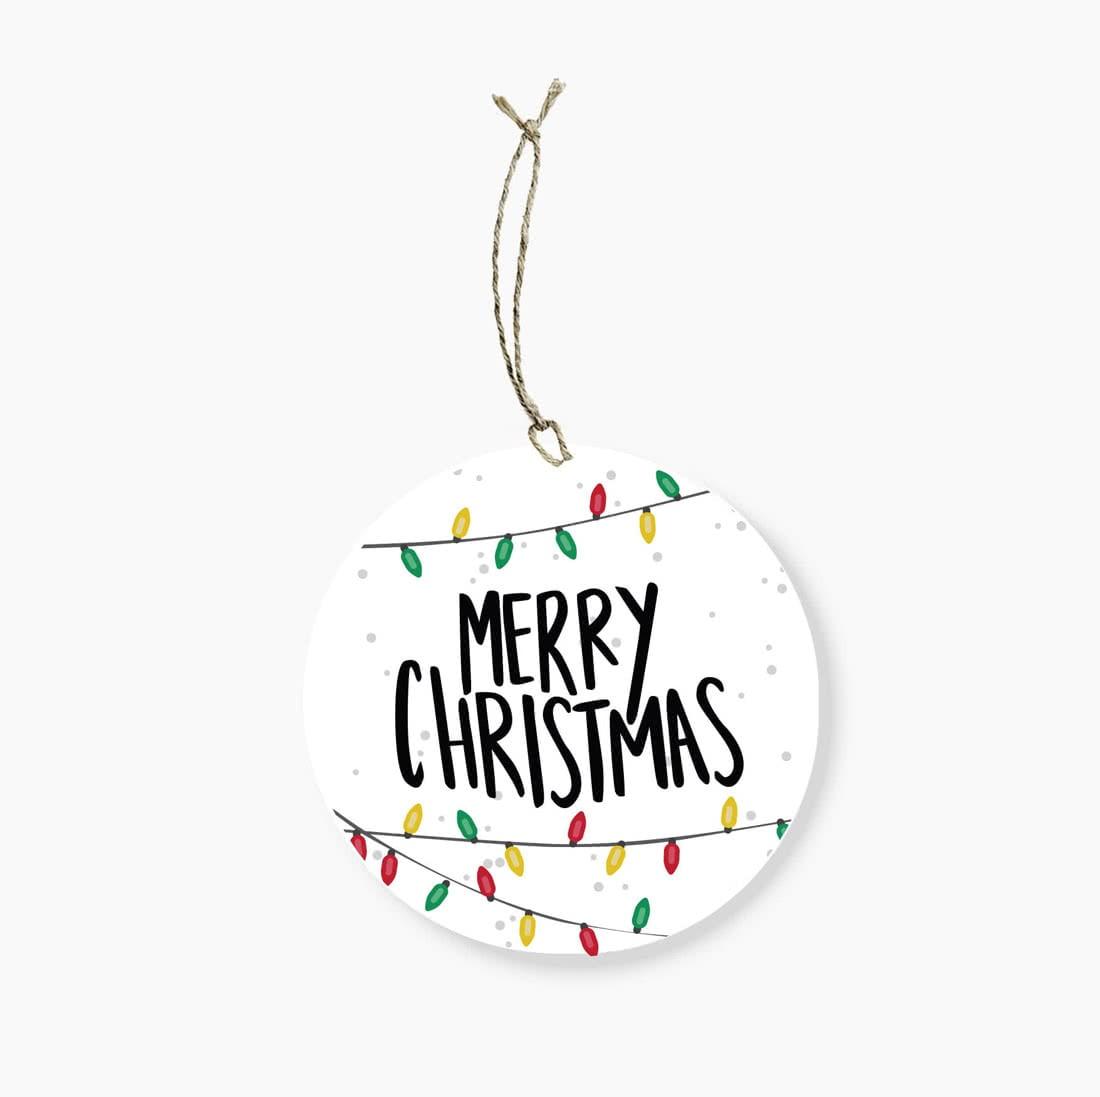 Merry Christmas Lights.Merry Christmas Lights Round Gift Tag